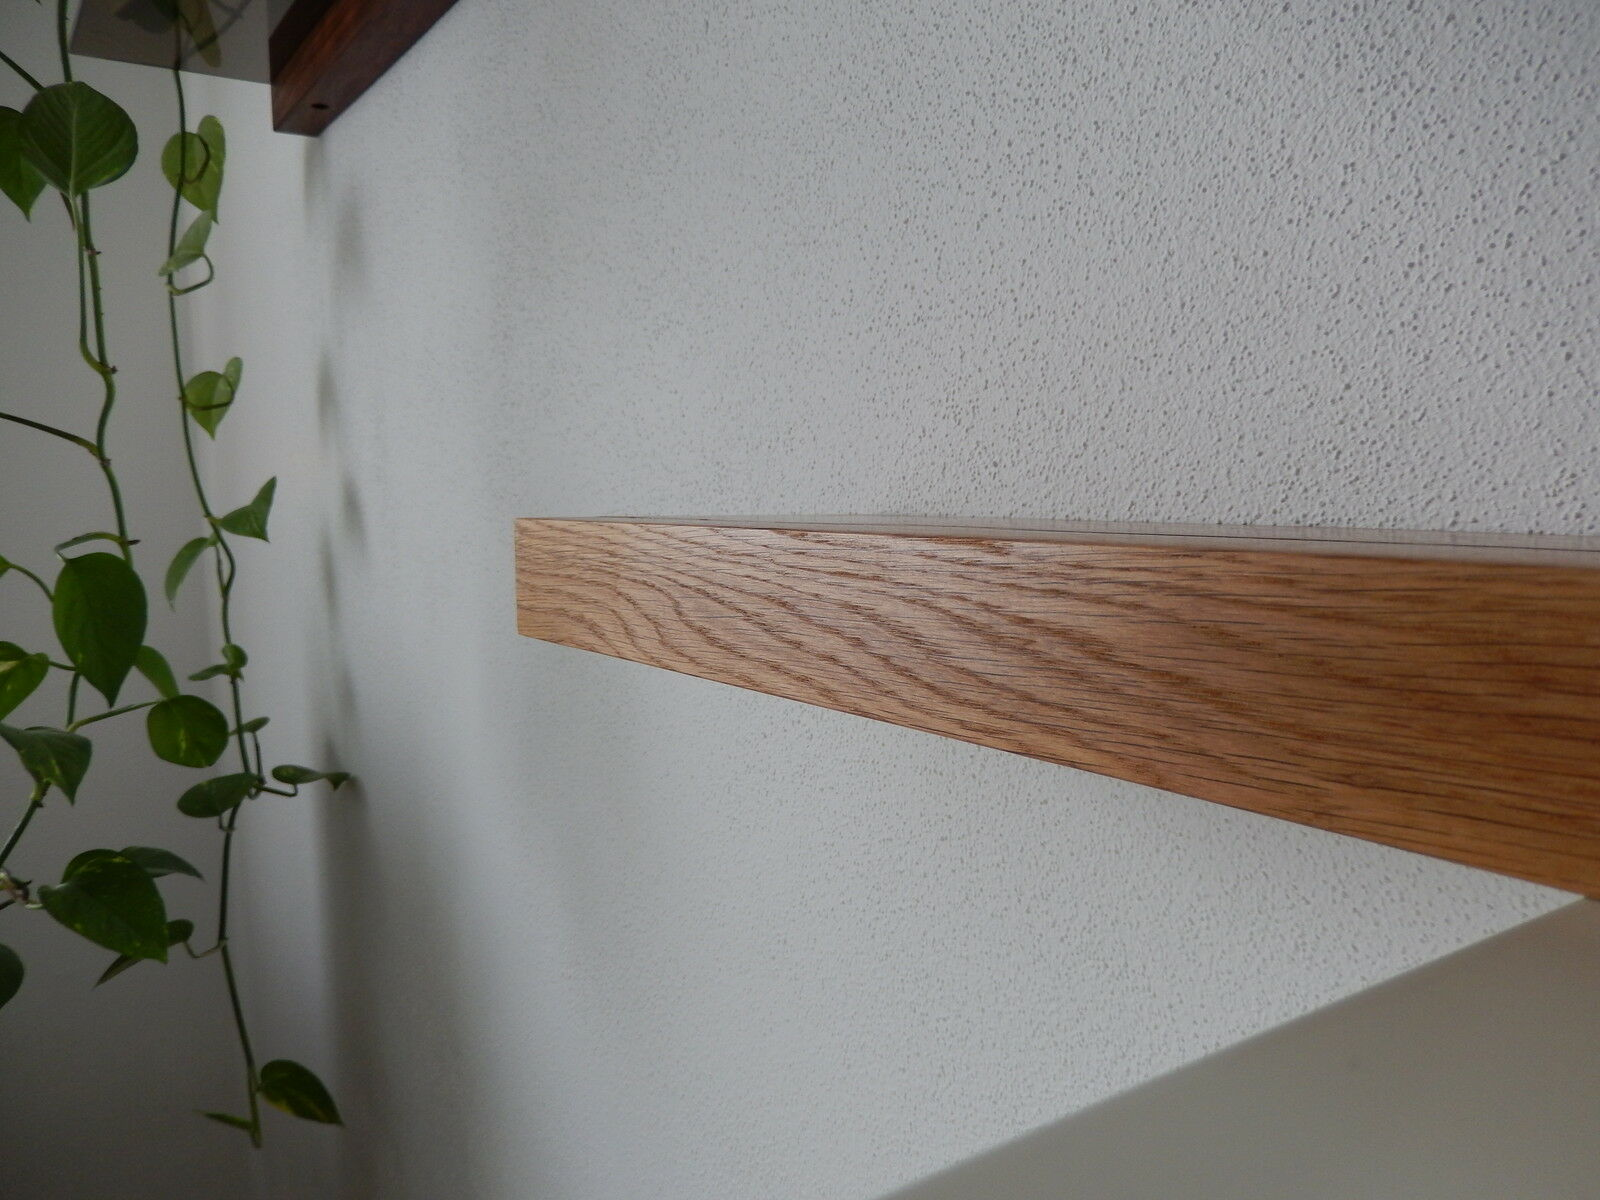 wandboard eiche massiv holz board regal steckboard regalbrett neu auch auf ma eur 99 00. Black Bedroom Furniture Sets. Home Design Ideas